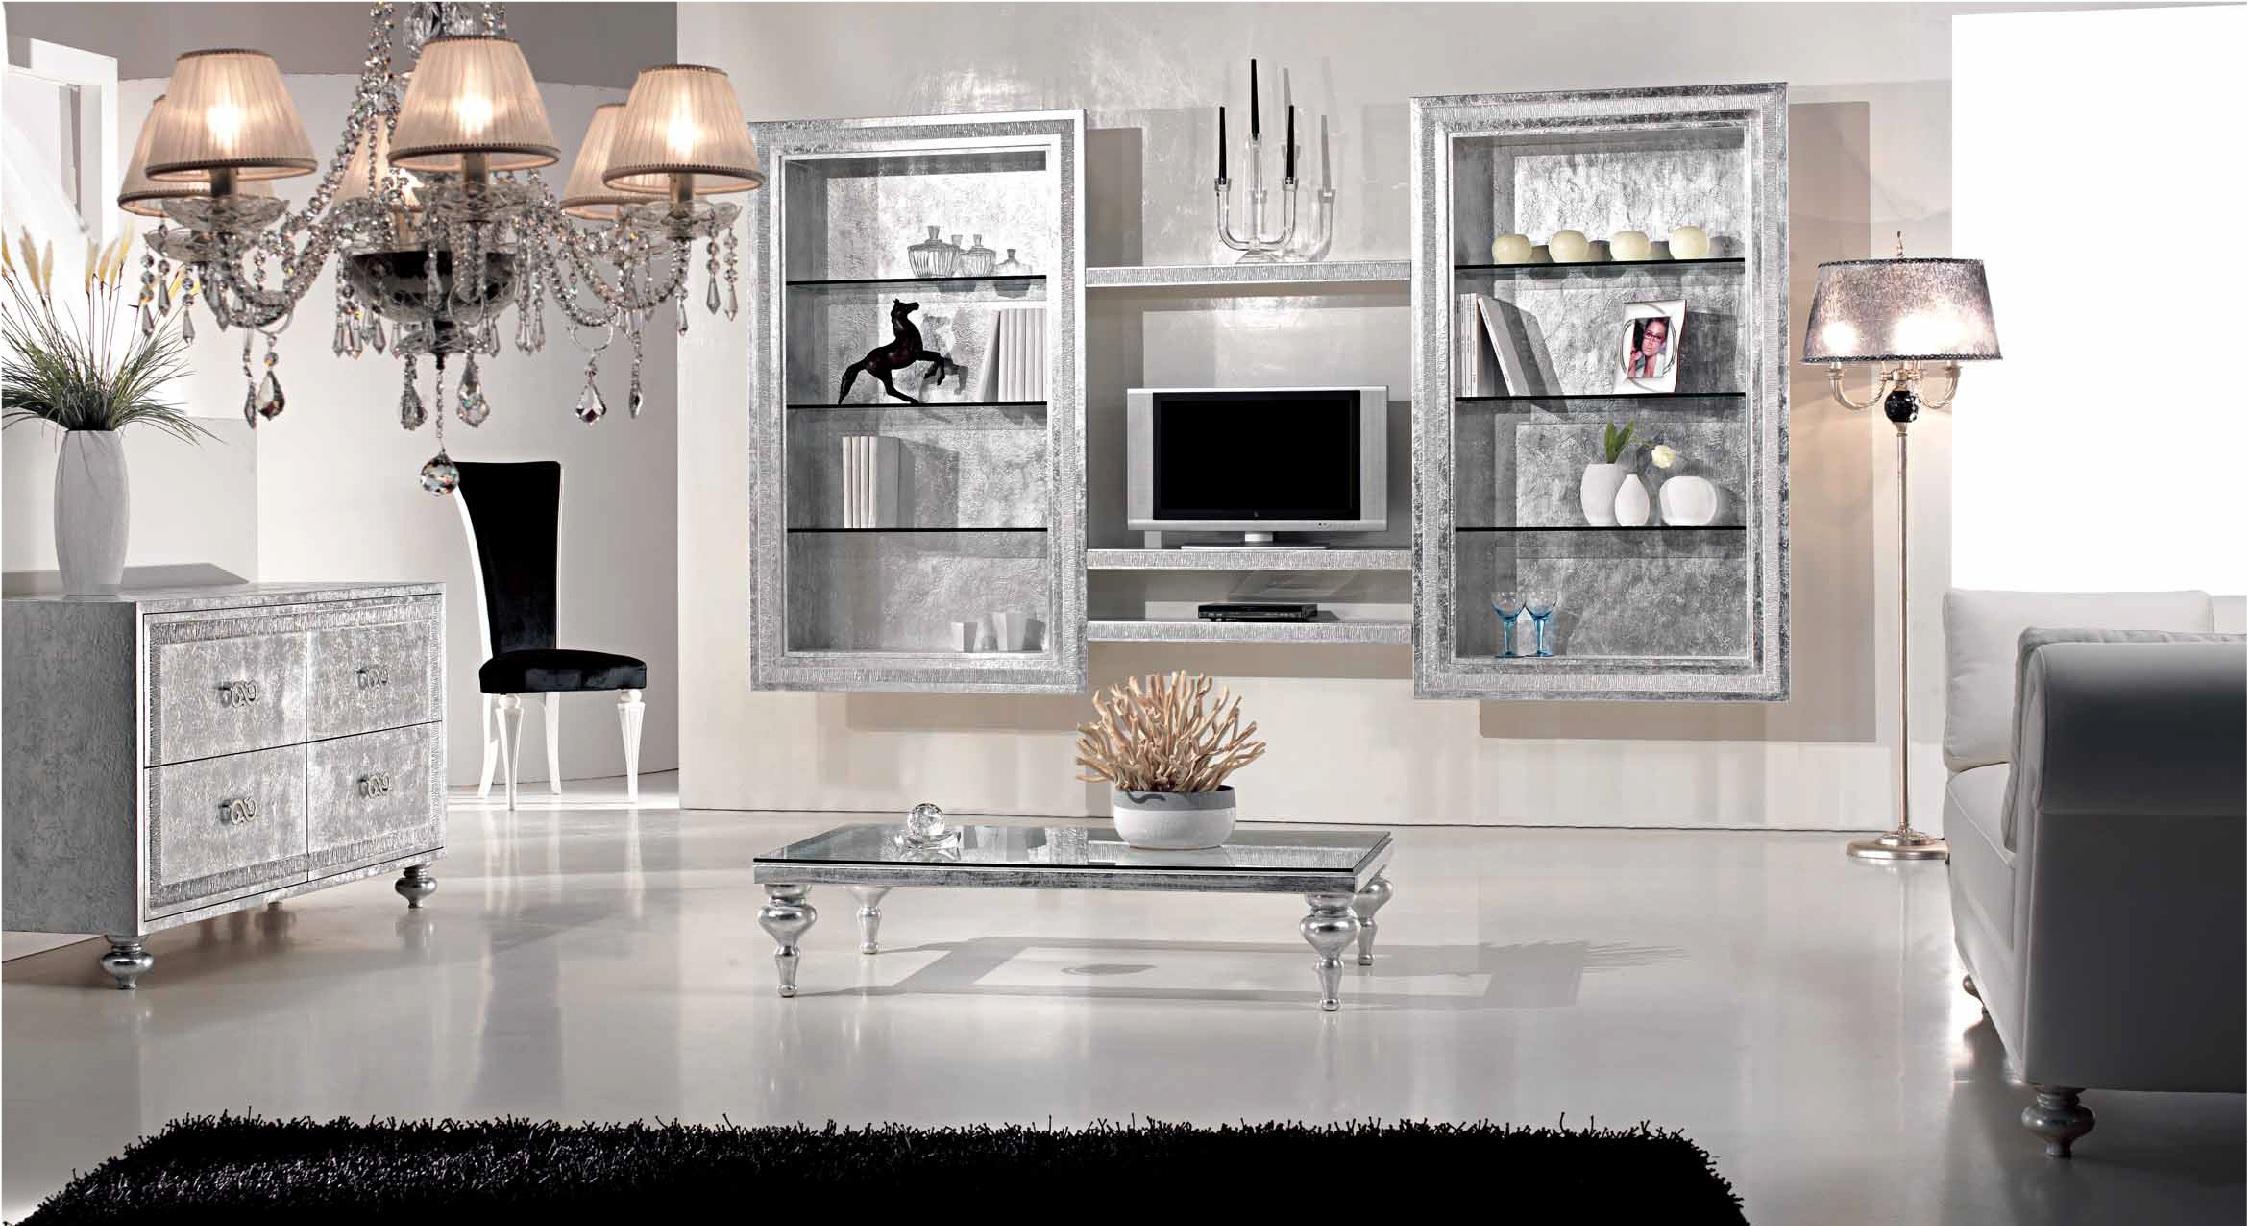 123 arredamento moderno di lusso arredamenti moderni di for Arredamenti per hotel di lusso